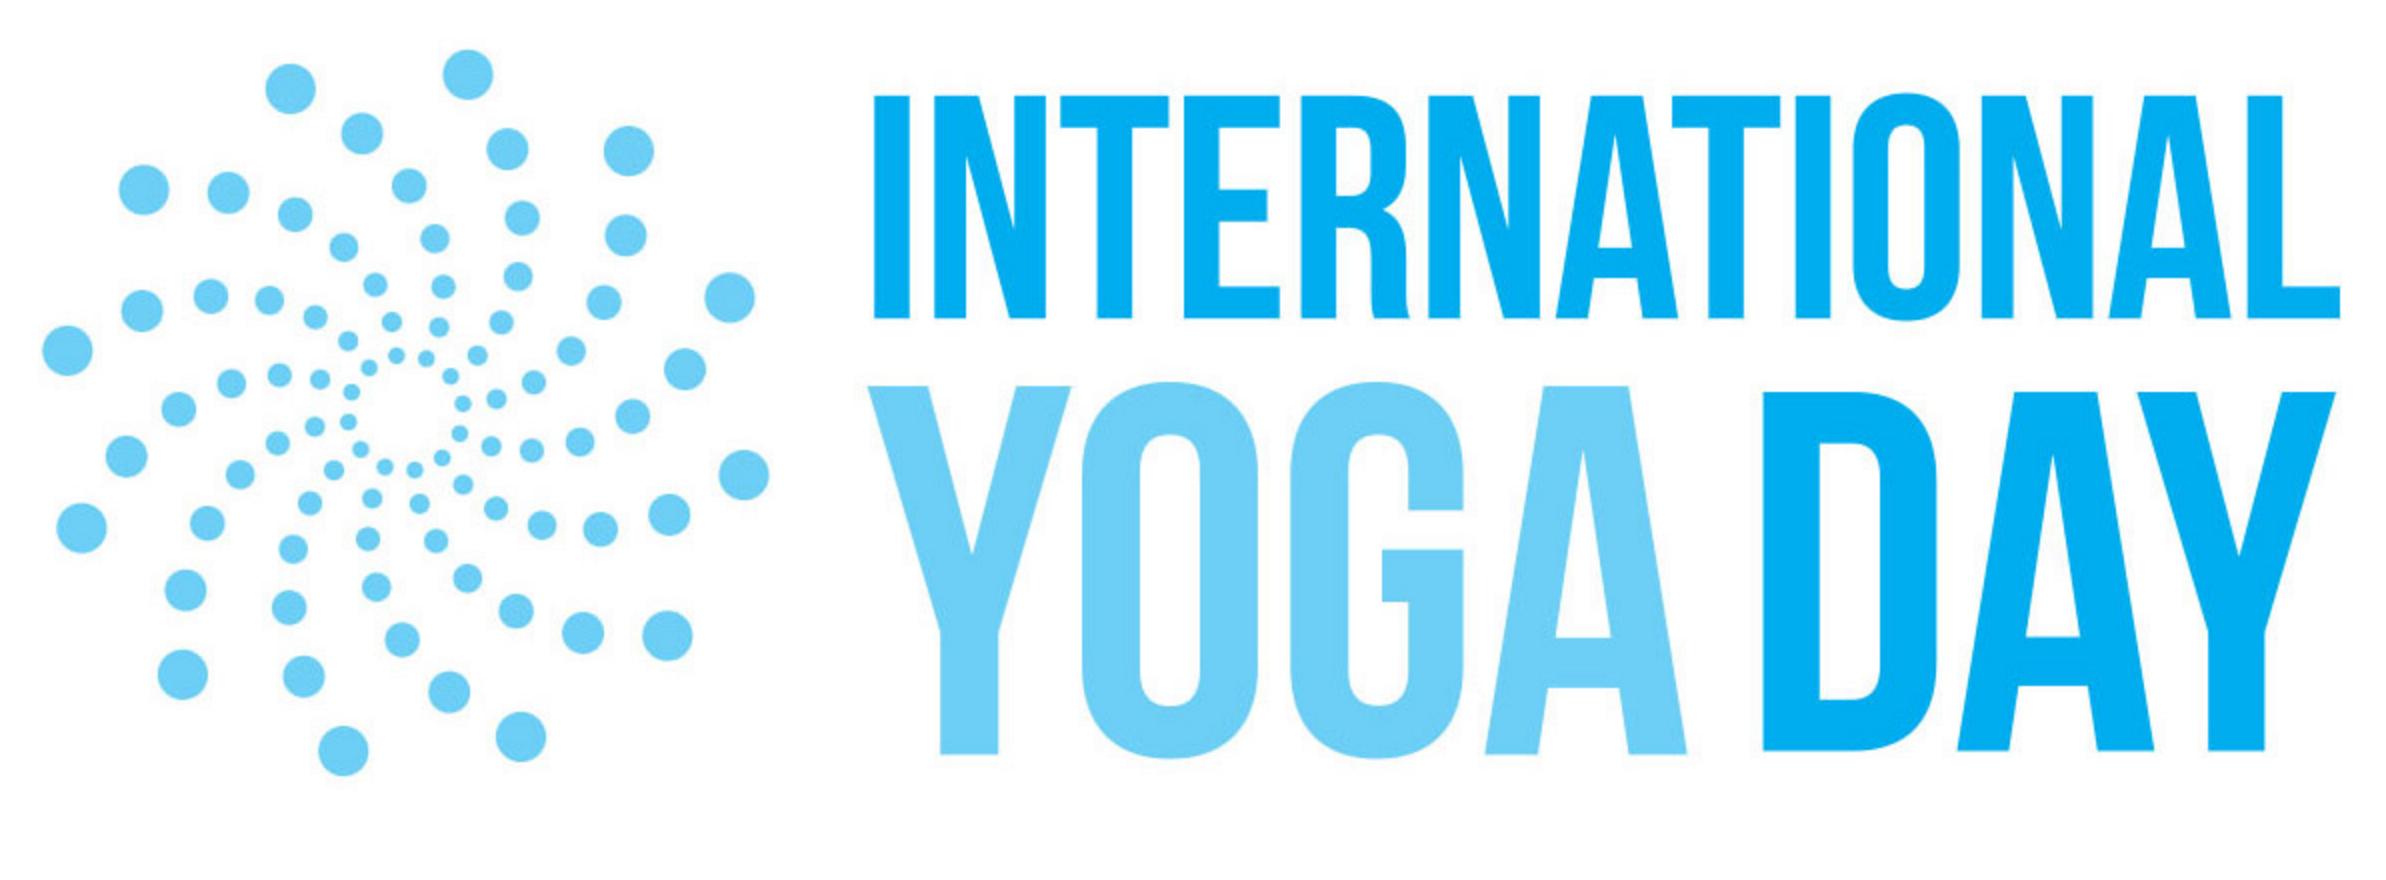 International Yoga Day 2019 Banner